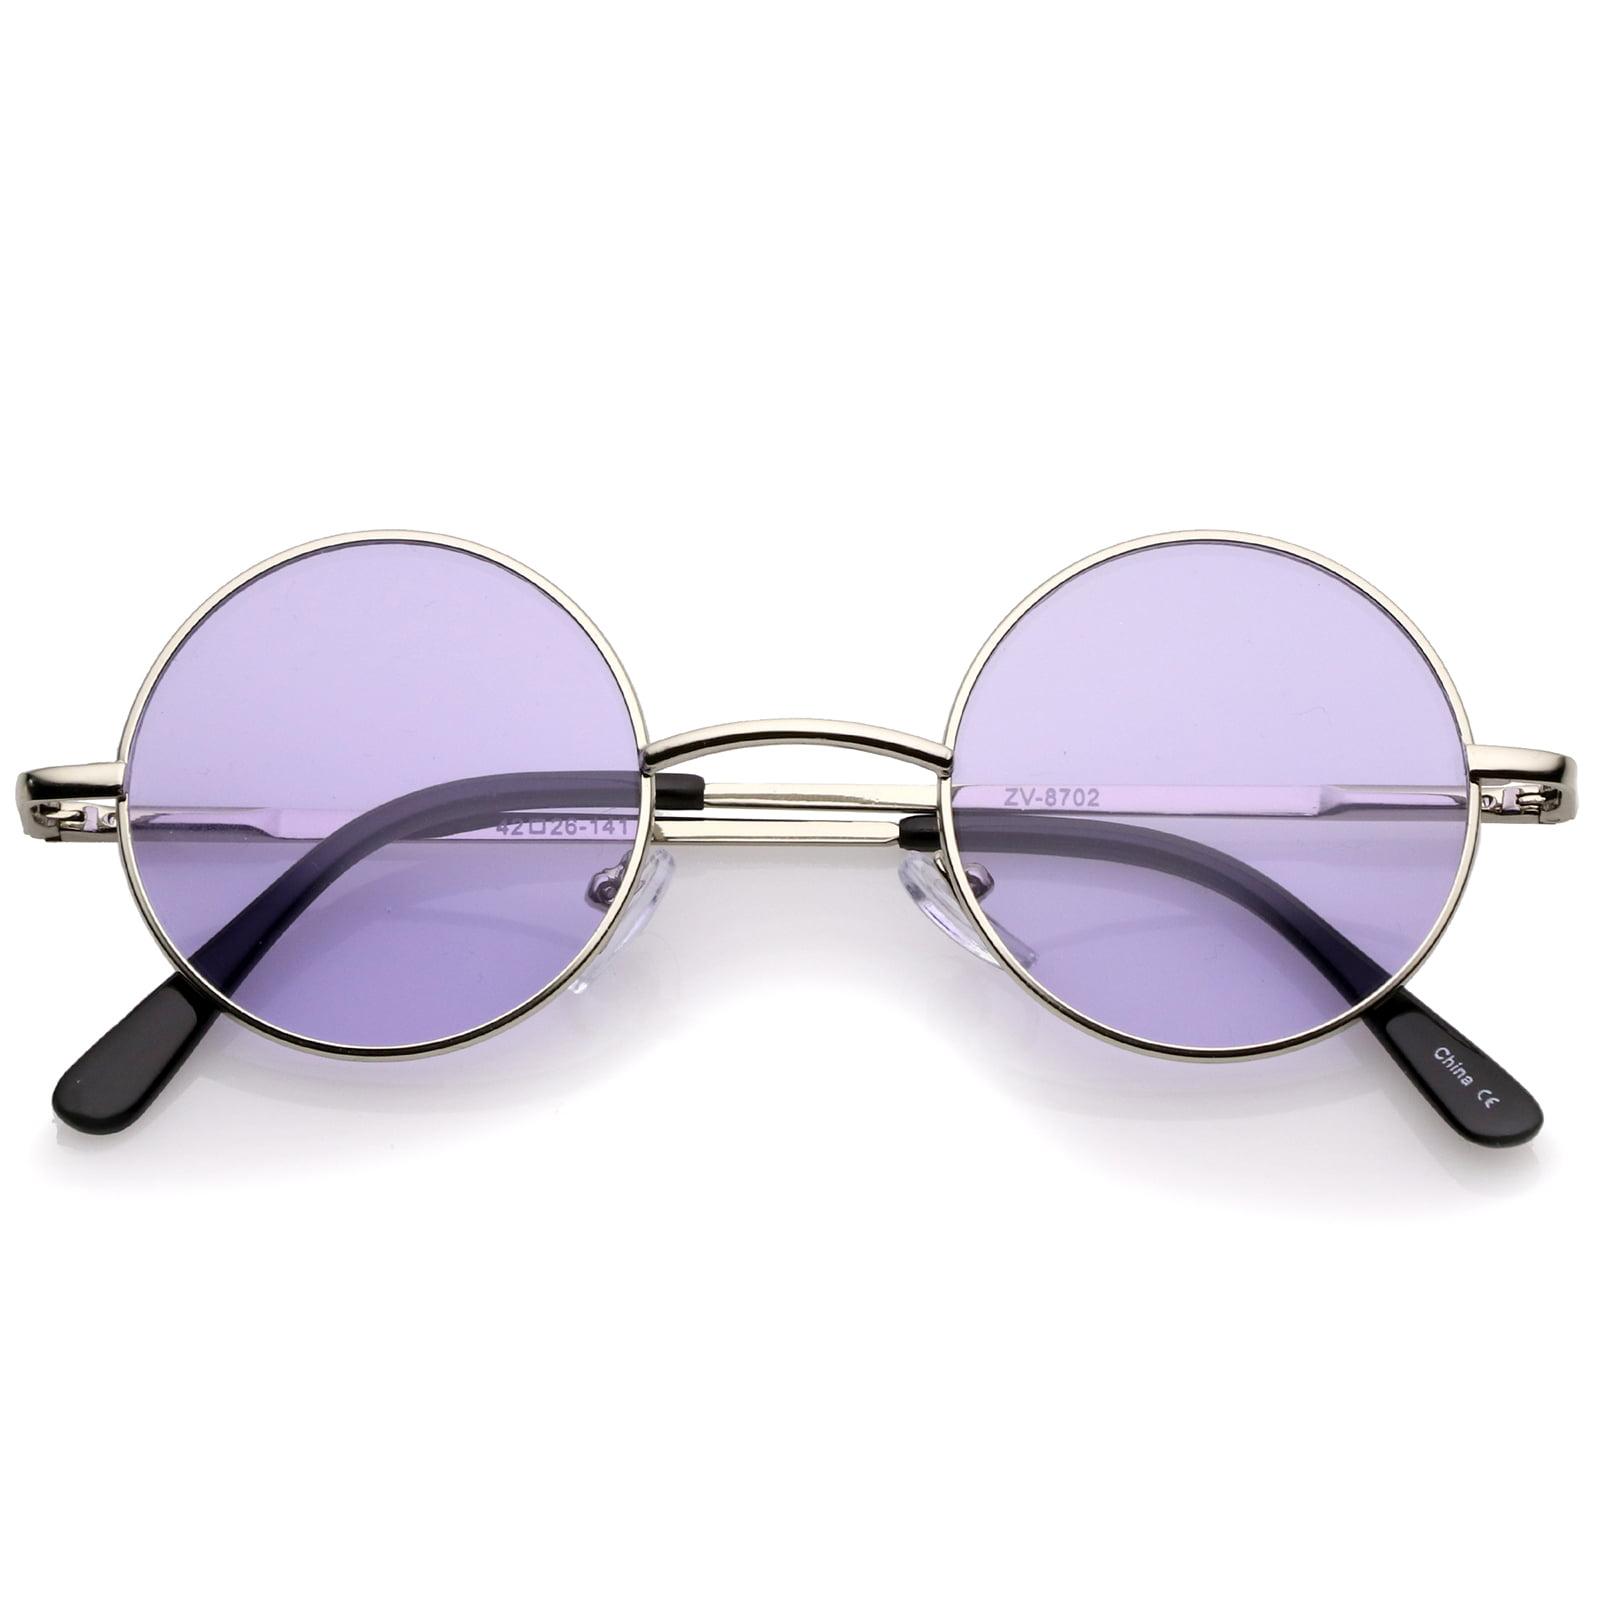 b67b5403068 sunglassLA - sunglassLA - Small Retro Lennon Inspired Style Colored Lens Round  Metal Sunglasses 41mm - 41mm - Walmart.com